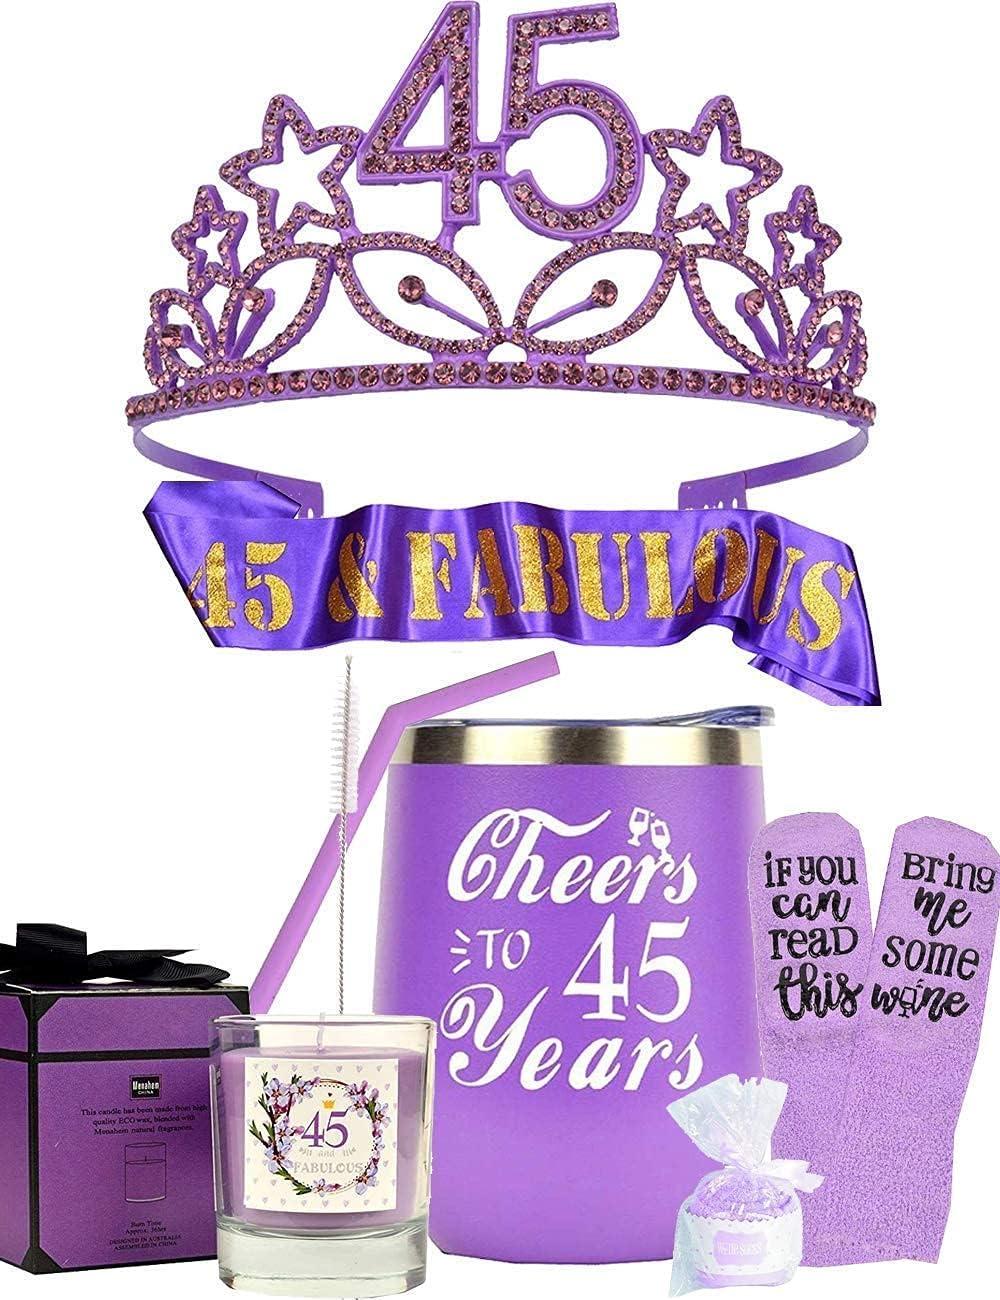 45th Birthday Gift for NEW売り切れる前に☆ Woman I'm Turnin 45 上品 Best